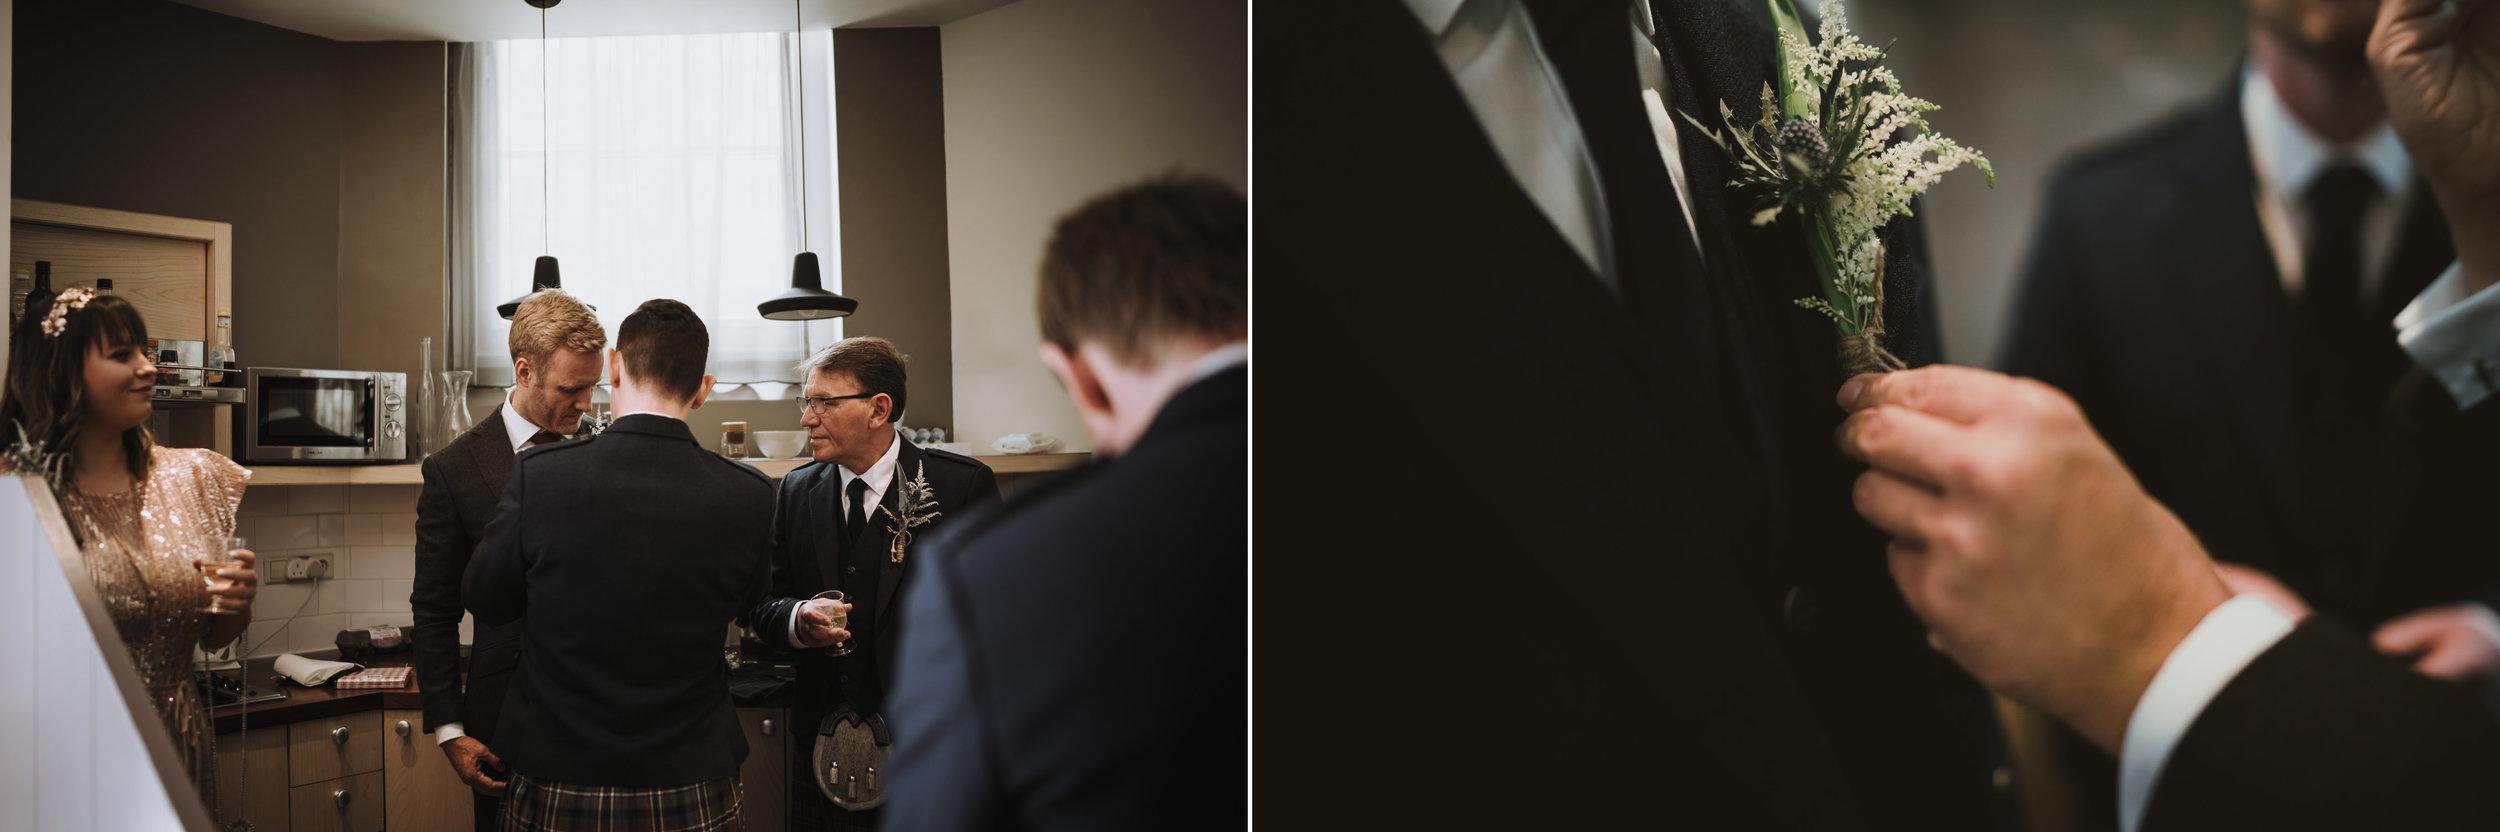 amsterdam-wedding-photographer-trouwfotograaf-bruidsfotograaf-mark-hadden-bruidsfotografie-David & Ronald-453 copy.jpg